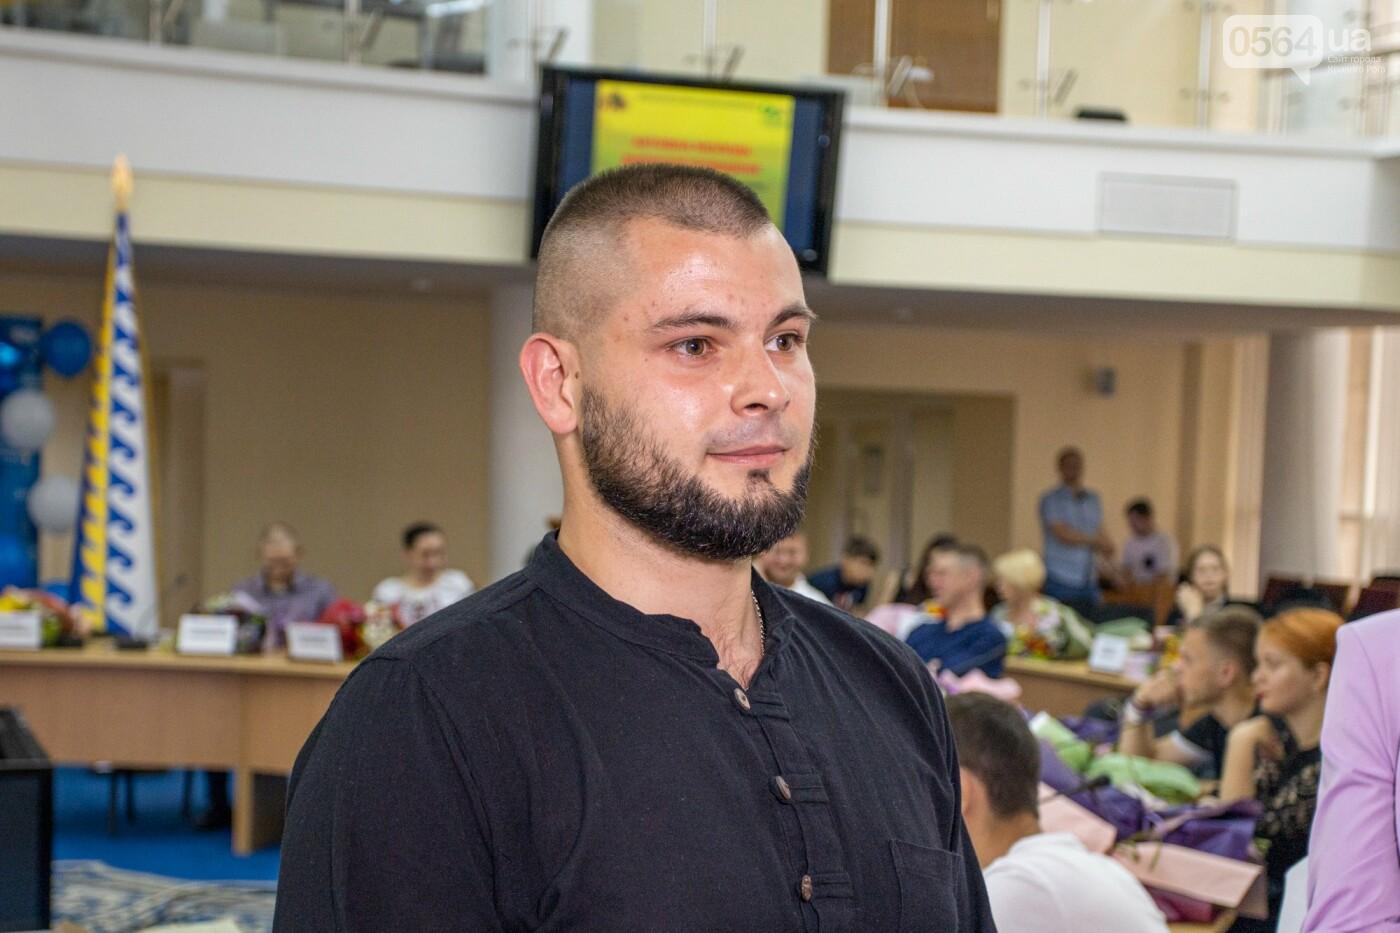 Молодым активистам Днепропетровщины вручили отличия и подарки, - ФОТО , фото-4